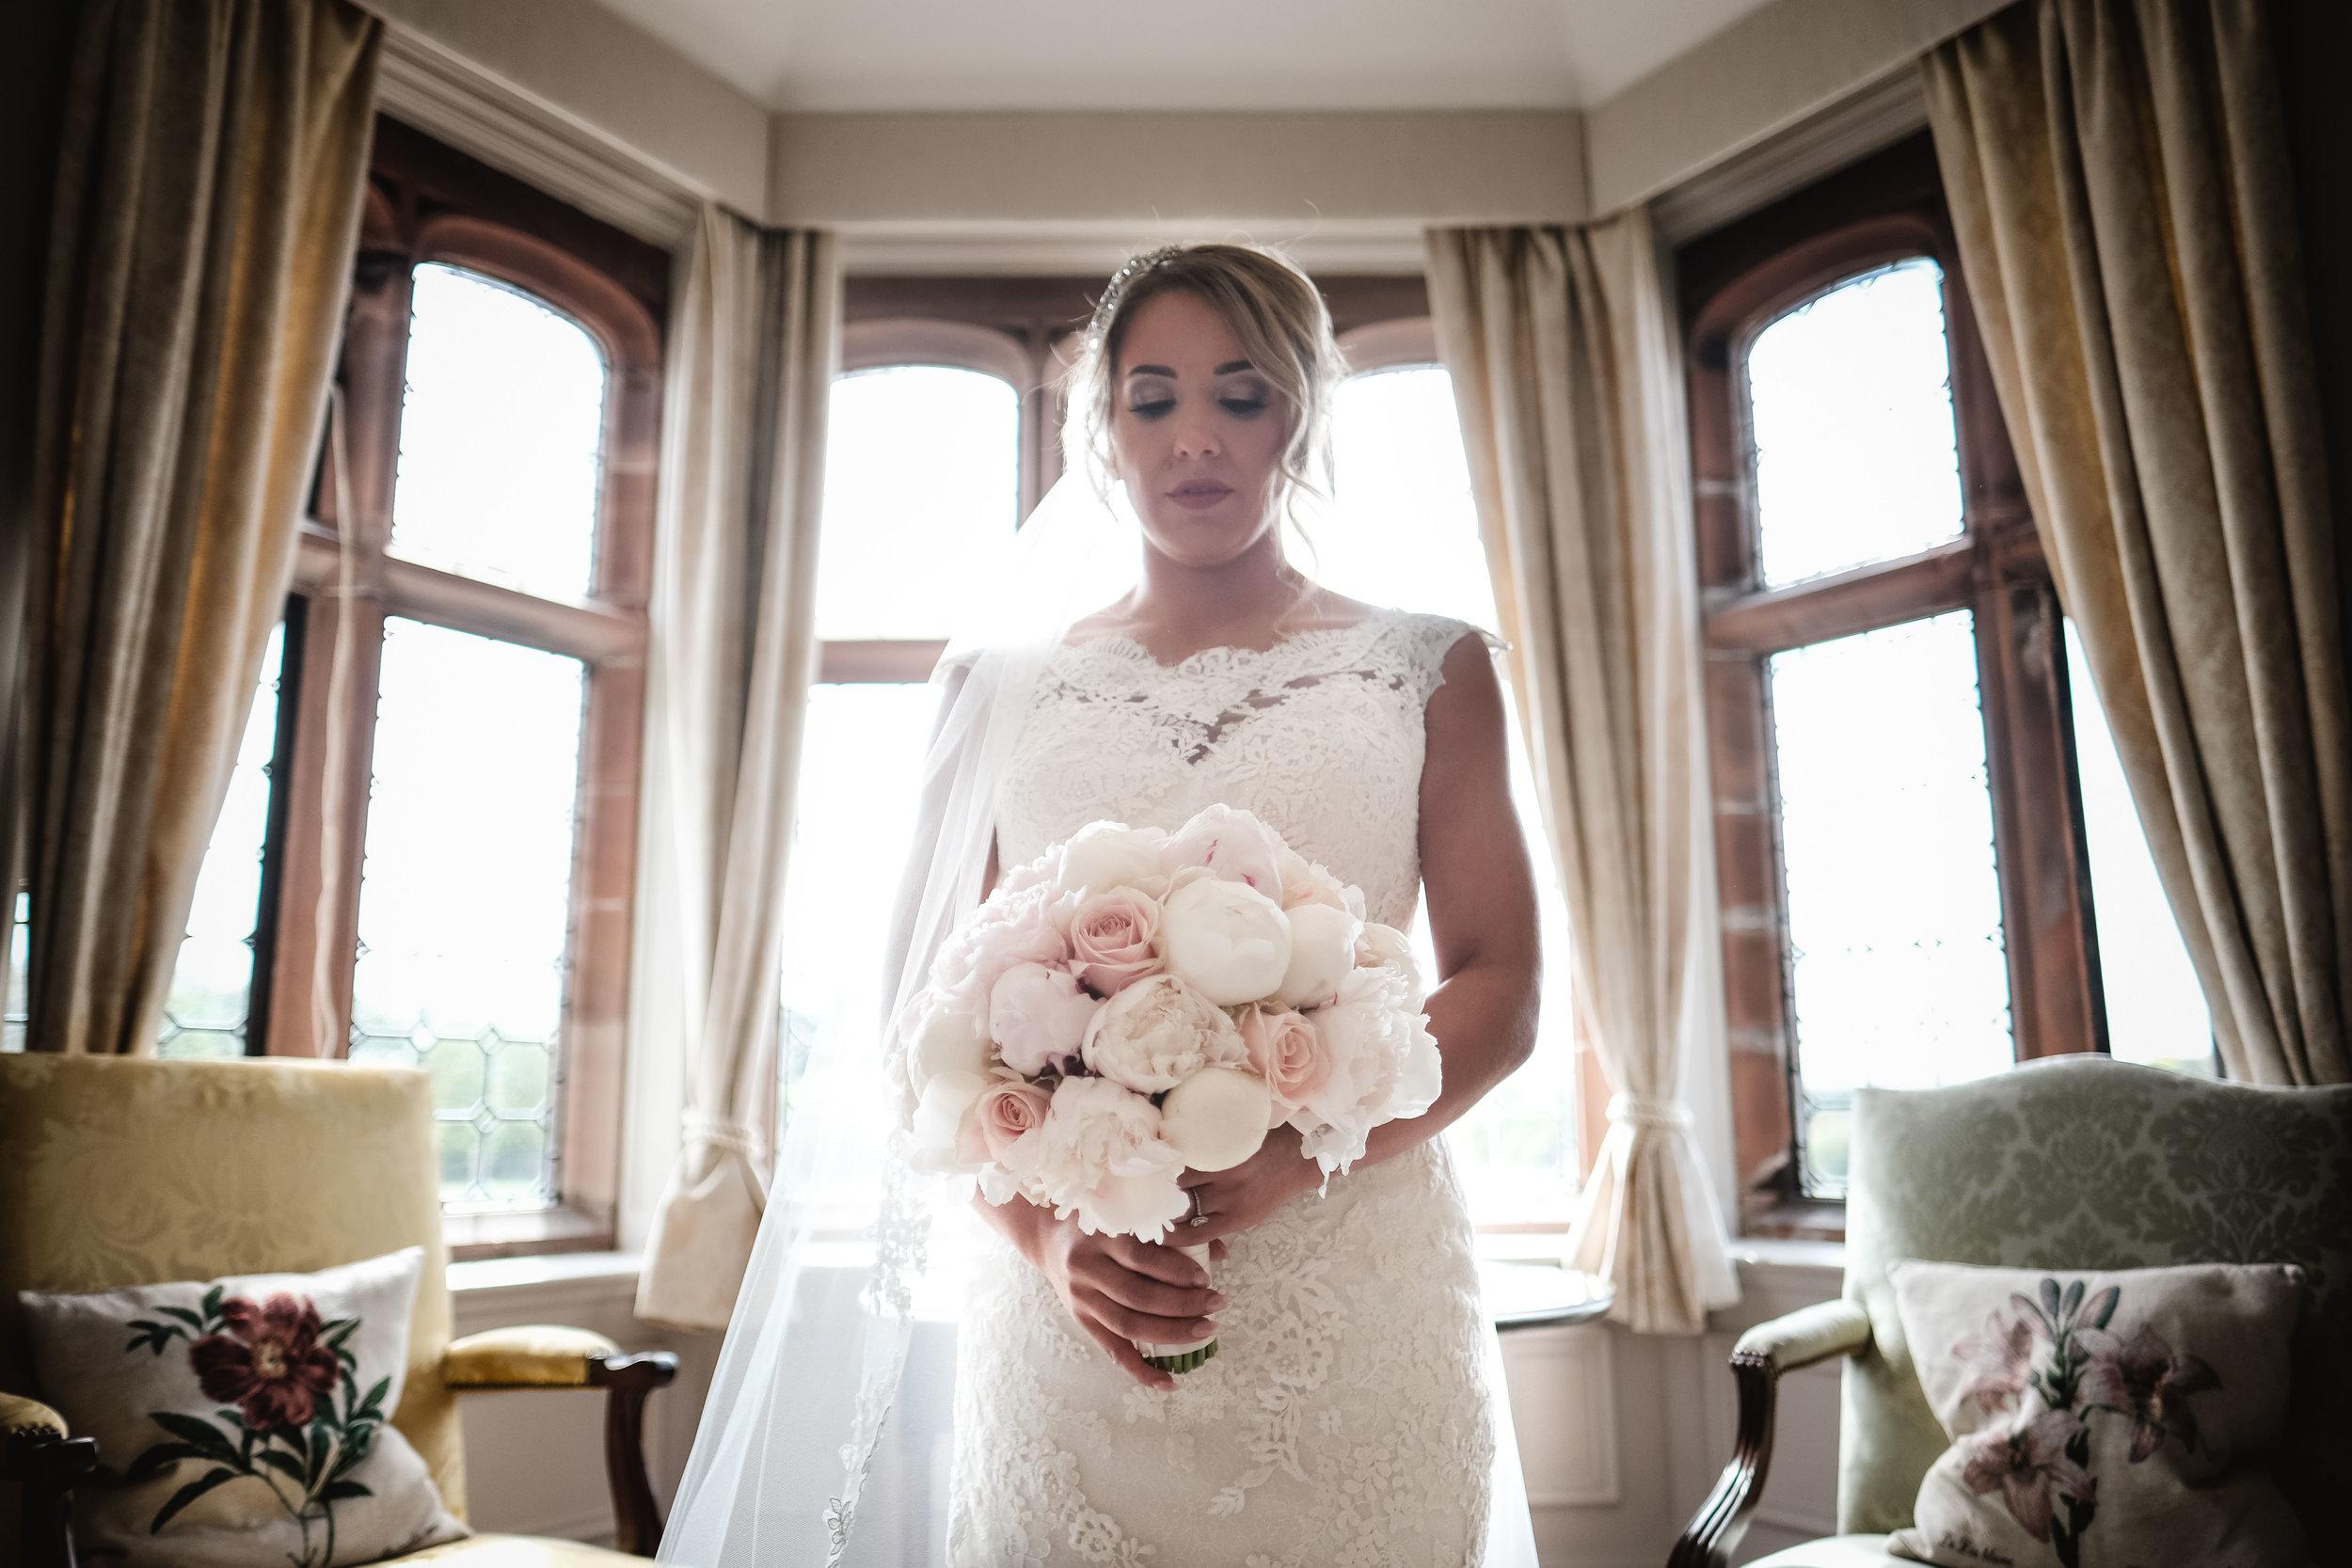 Thornton manor wedding photography cheshire wedding photographer liverpool manchester warrington chester wirral wedding BLOG (27 of 108).jpg